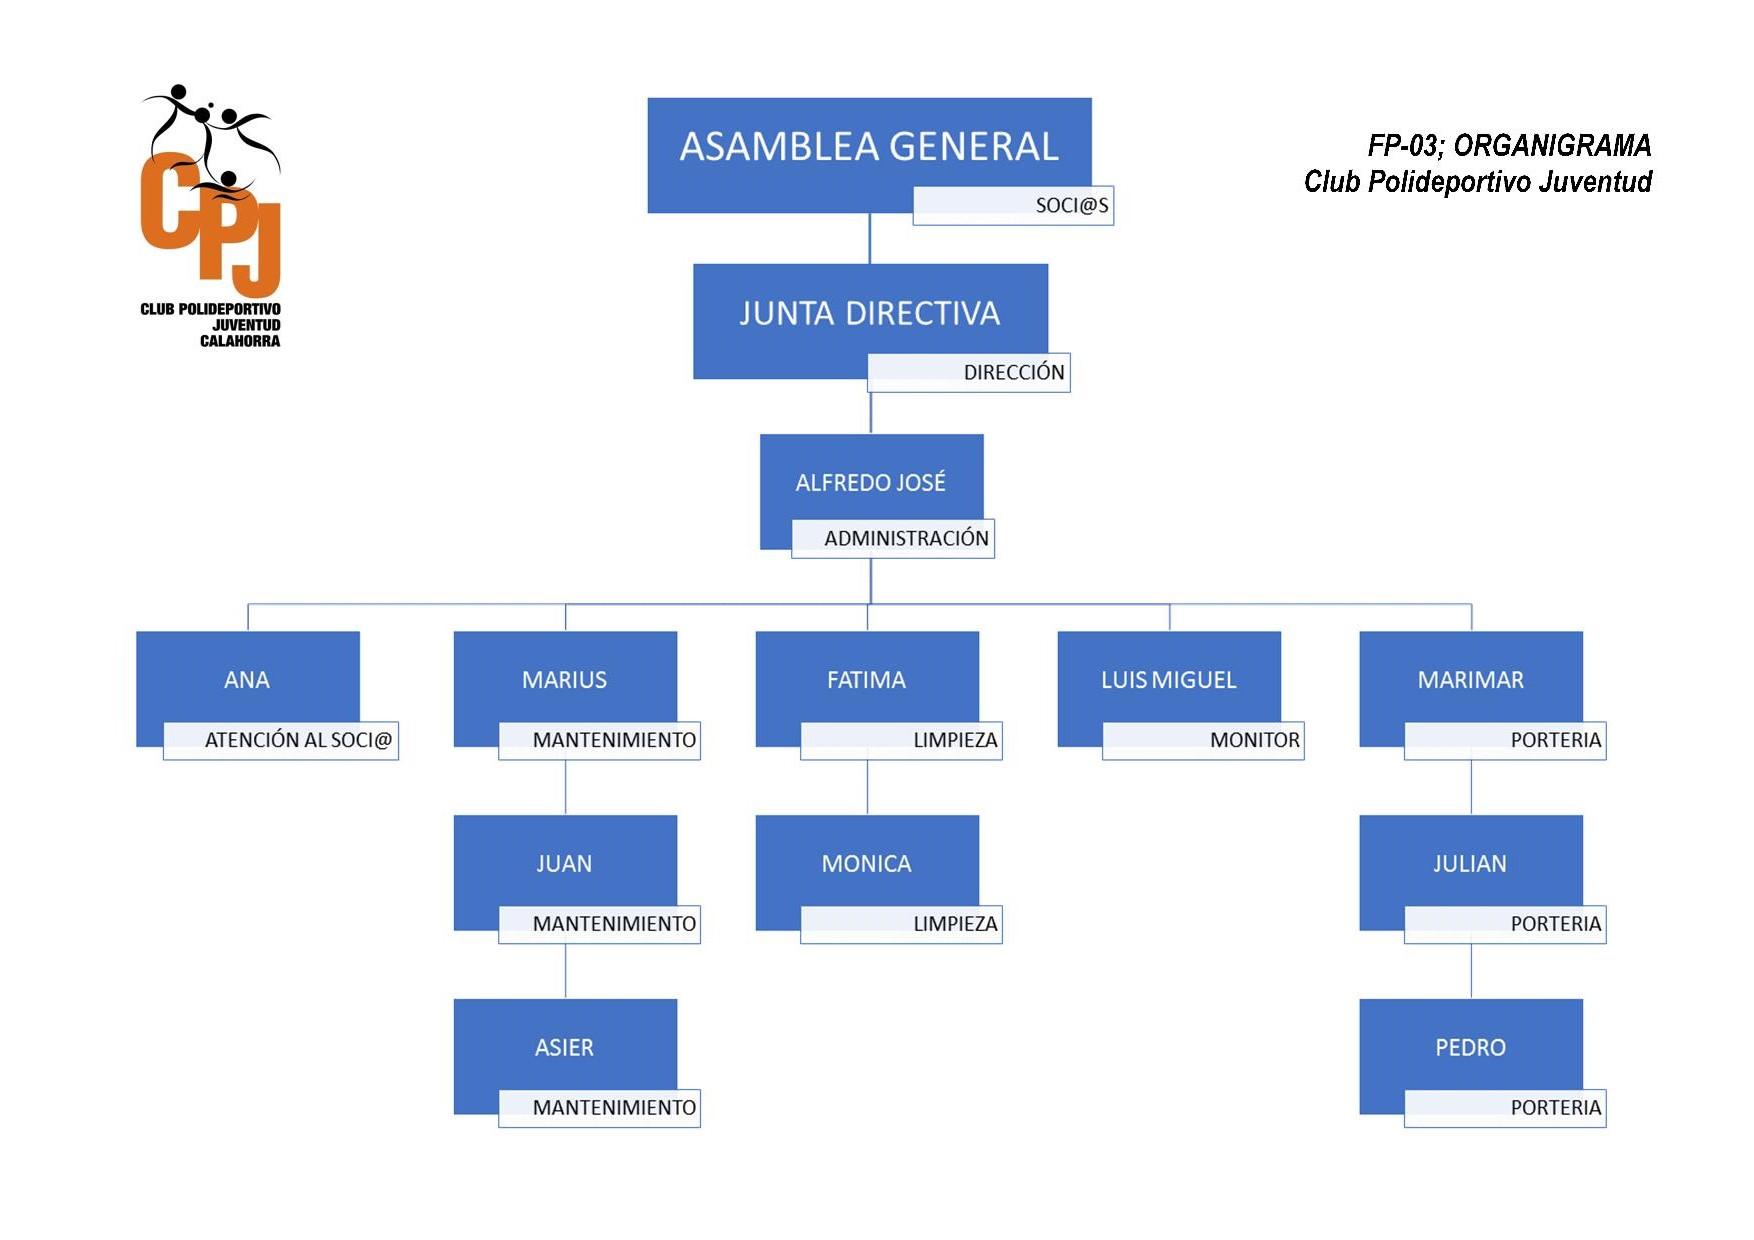 Organigrama Polideportivo Juventud de Calahorra